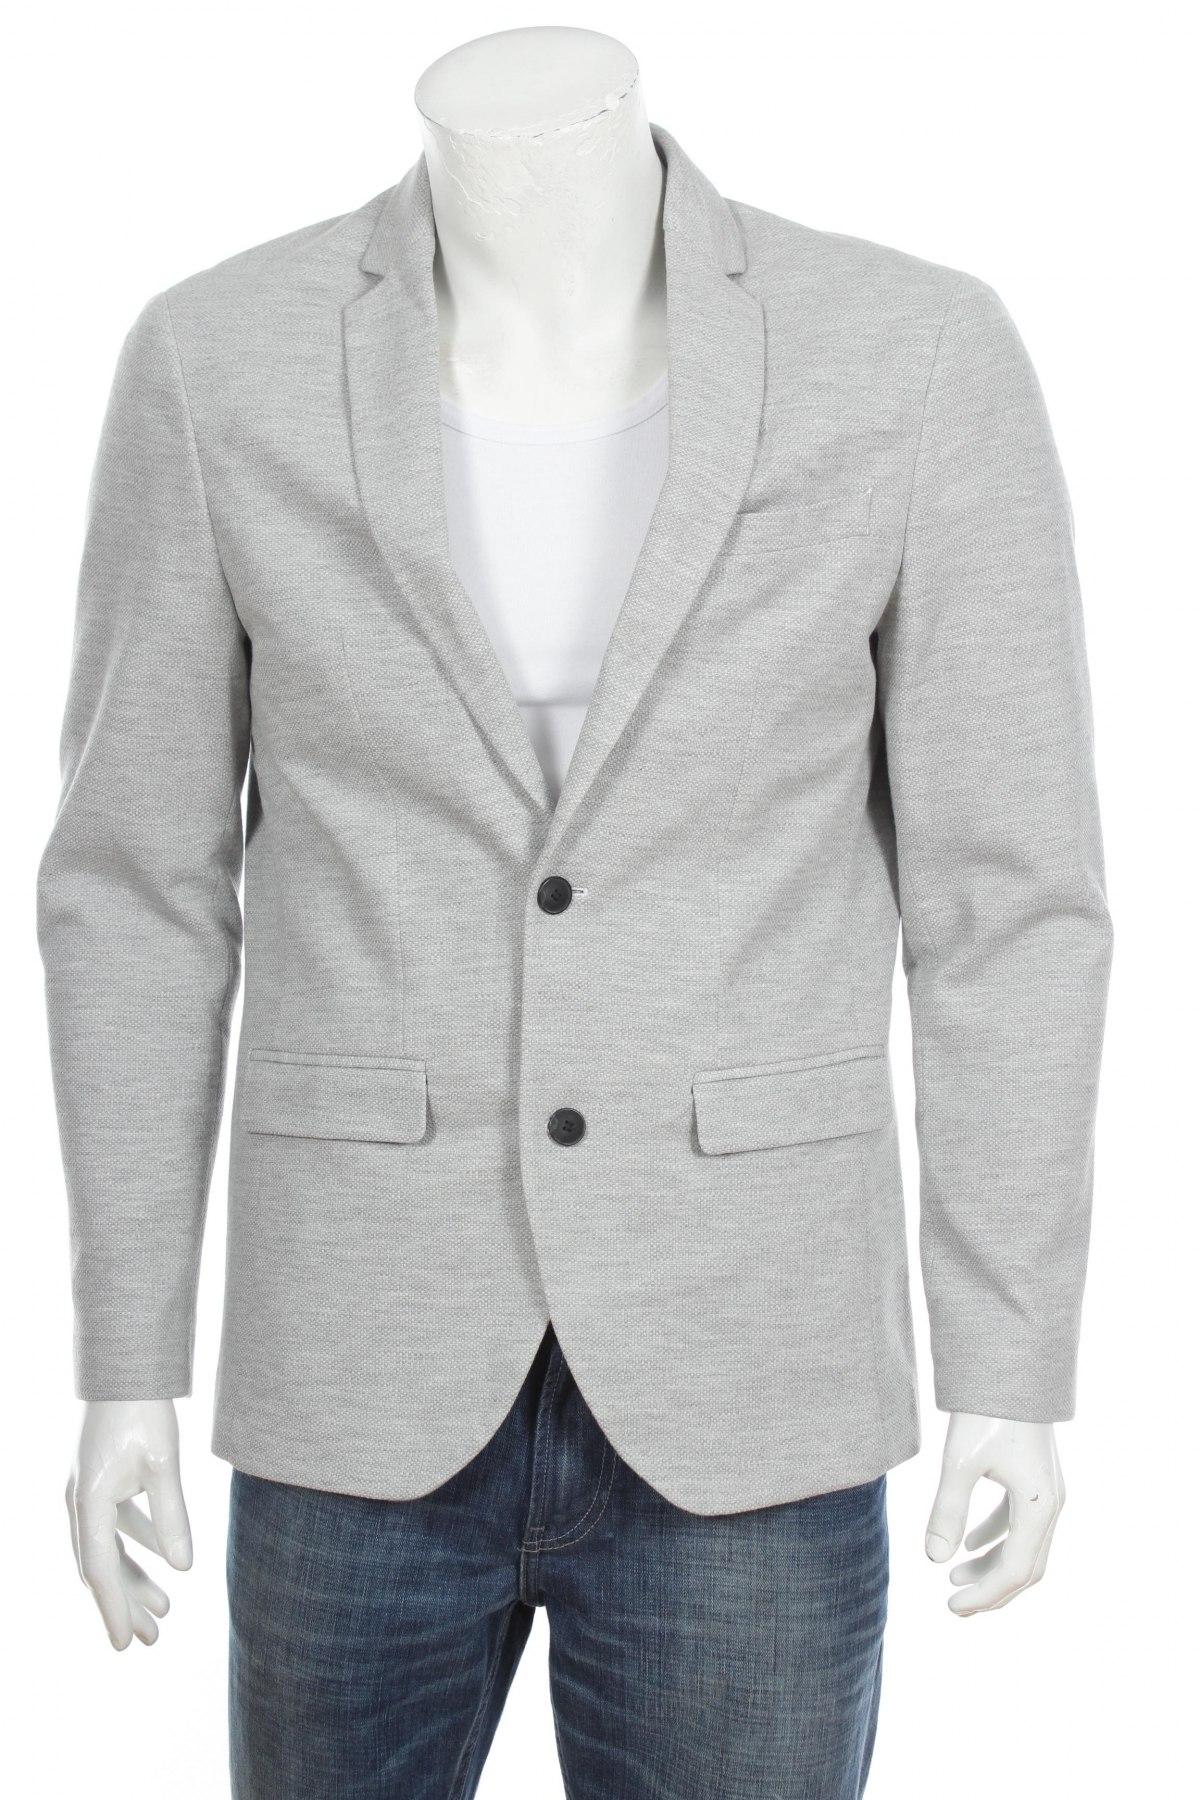 99f56b9adb0b Ανδρικό σακάκι Premium By Jack   Jones - σε συμφέρουσα τιμή στο ...